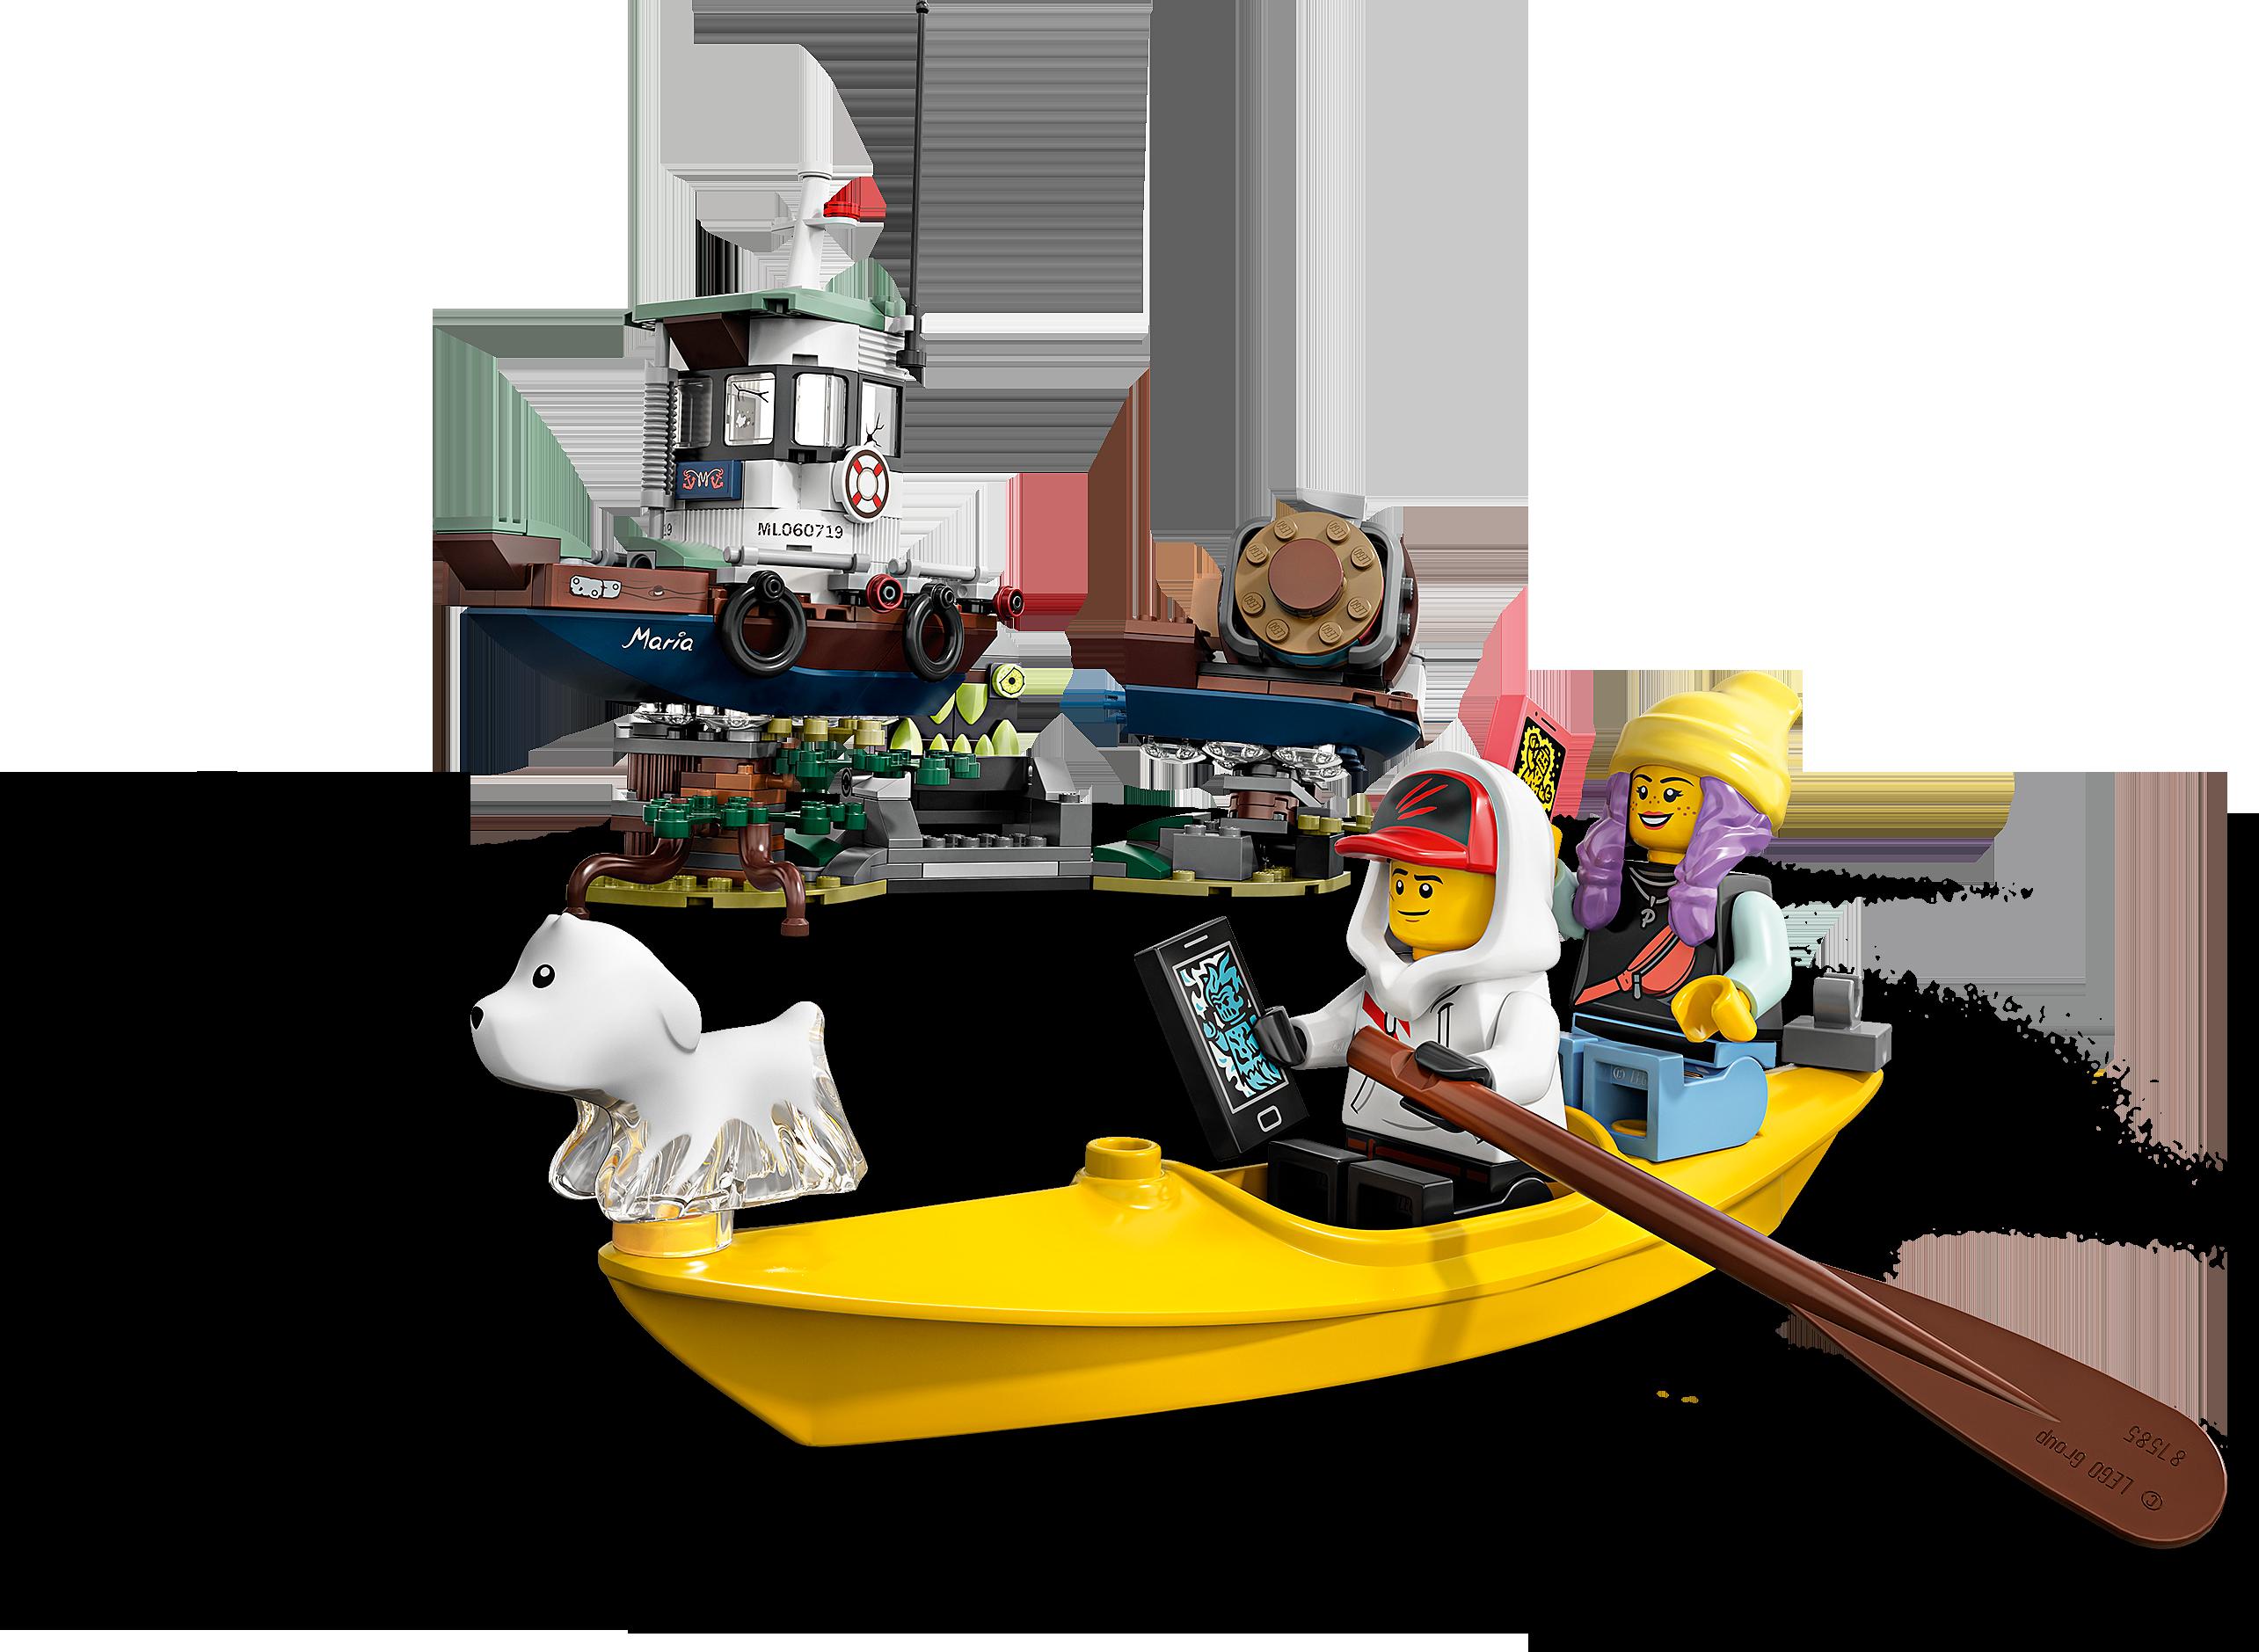 Wrecked Shrimp Boat